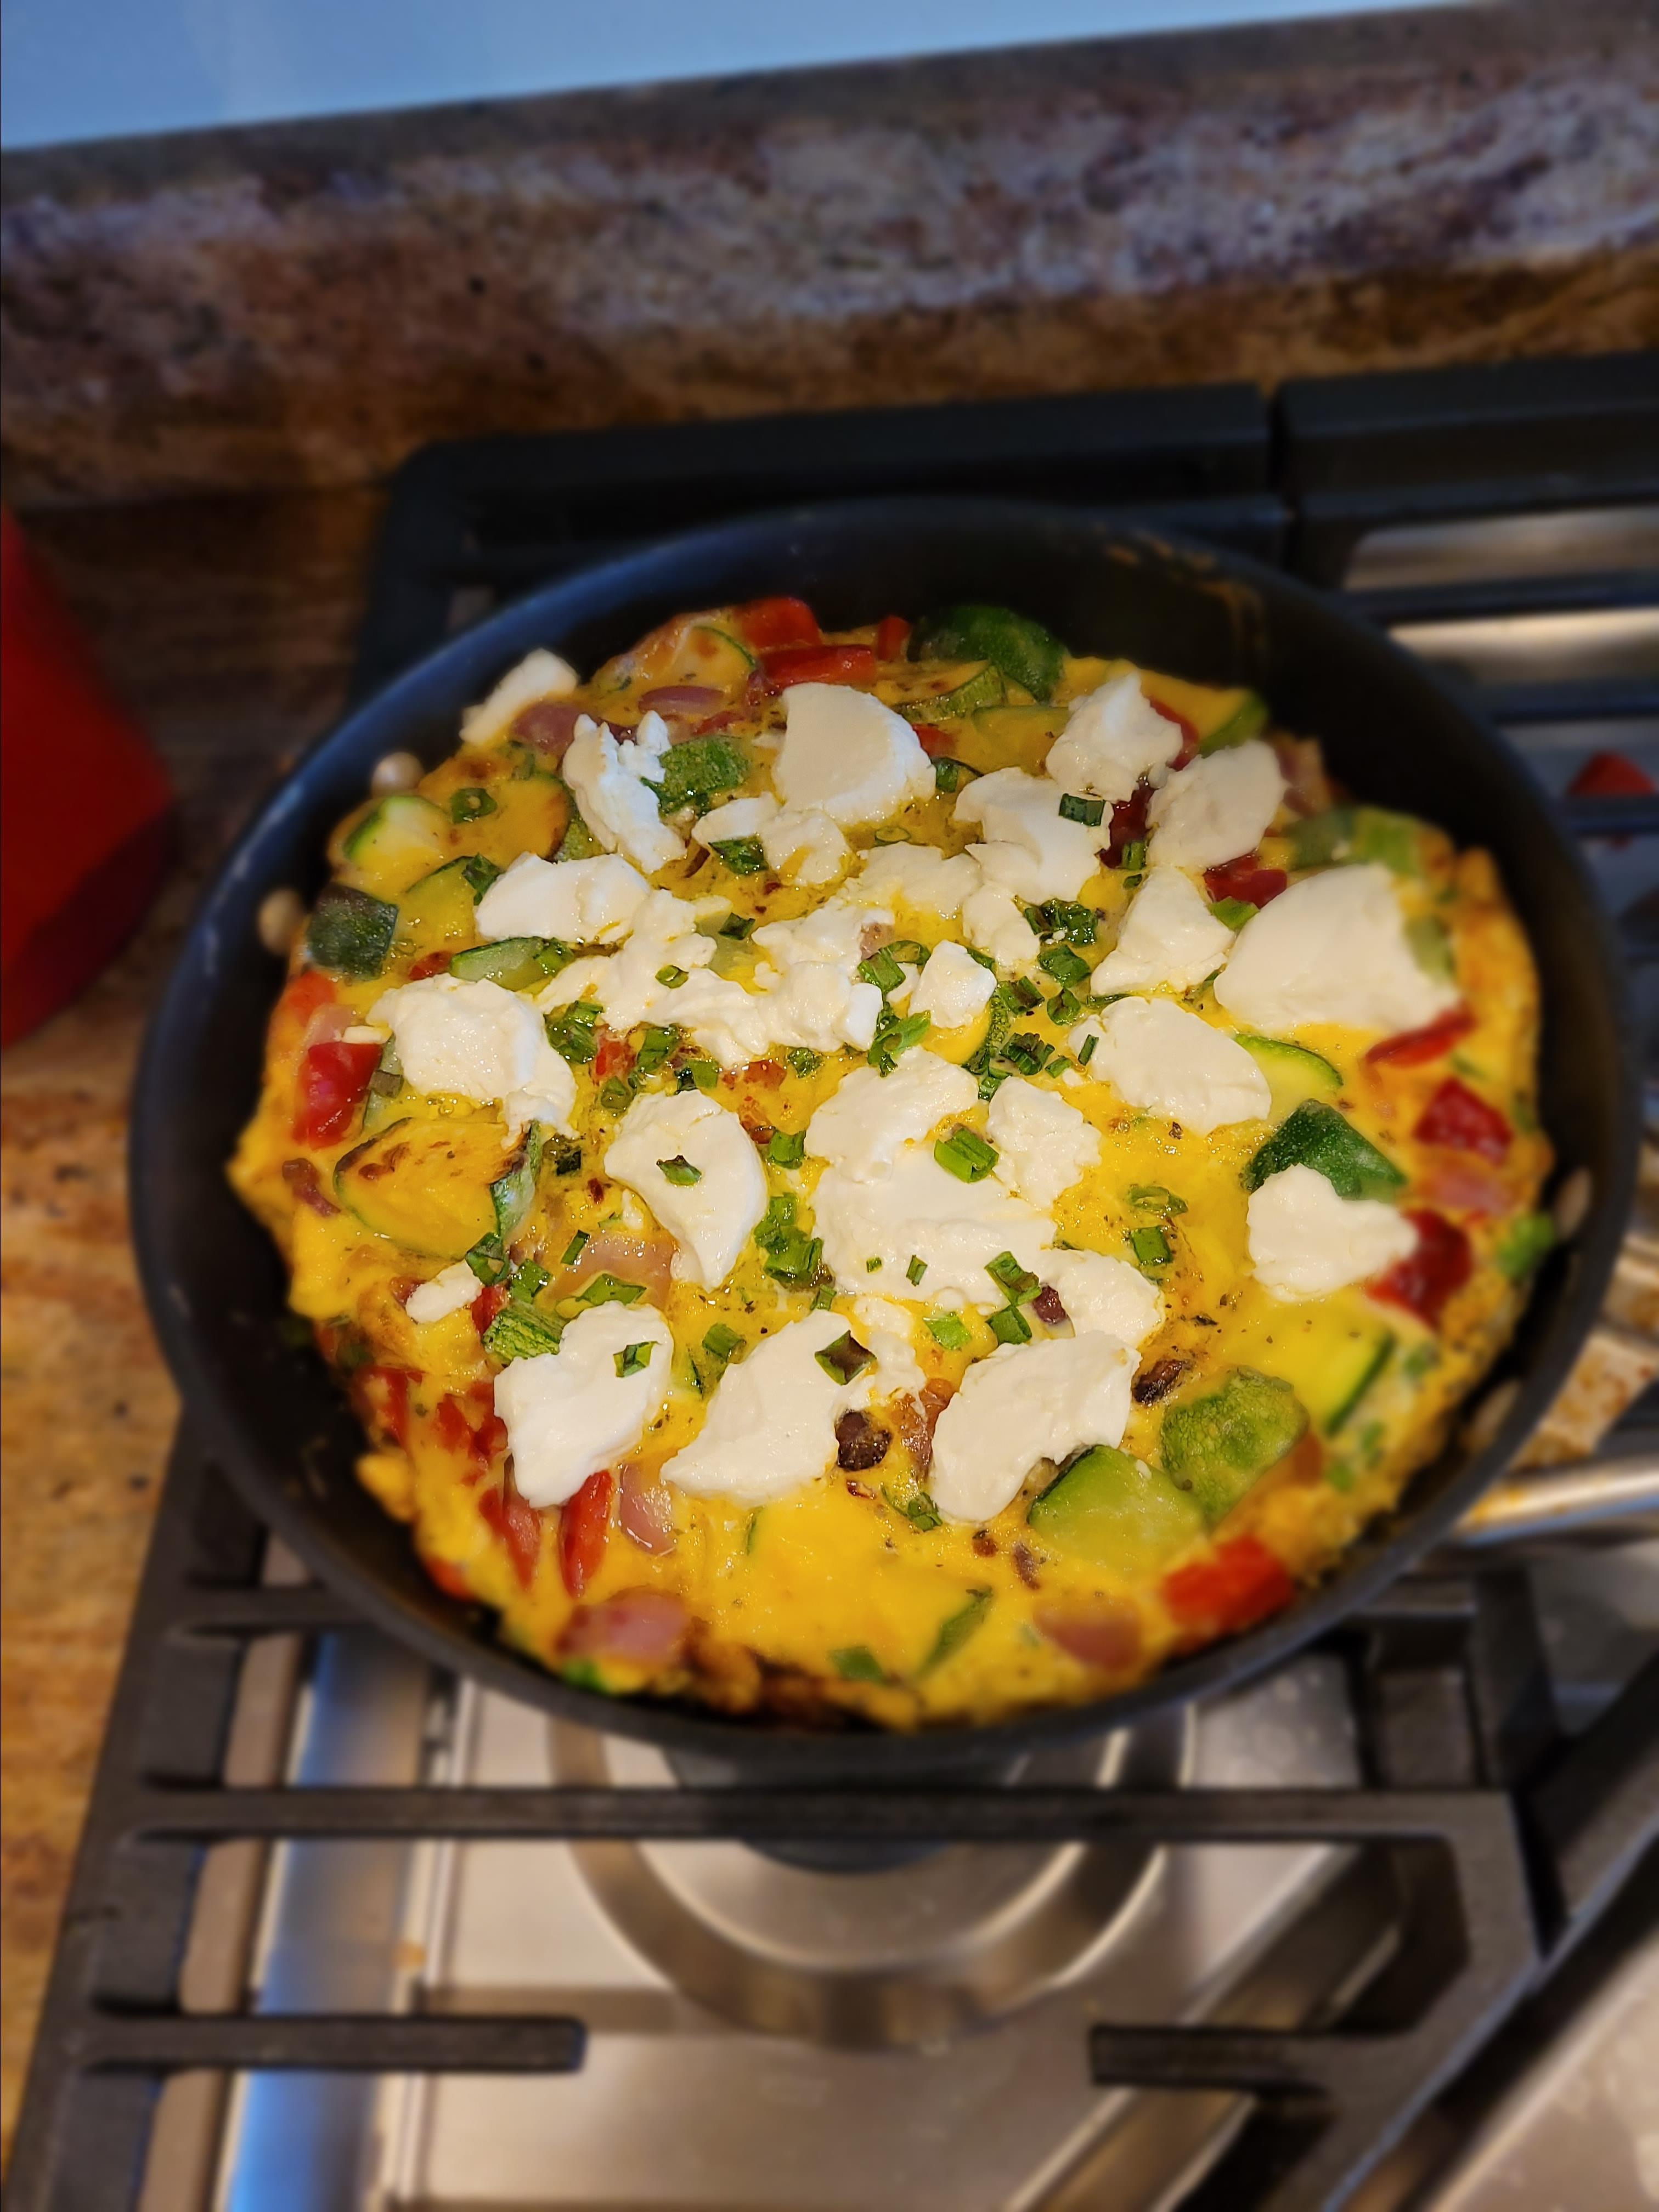 The Farmer's Frittata (Italian-Style Omelet)